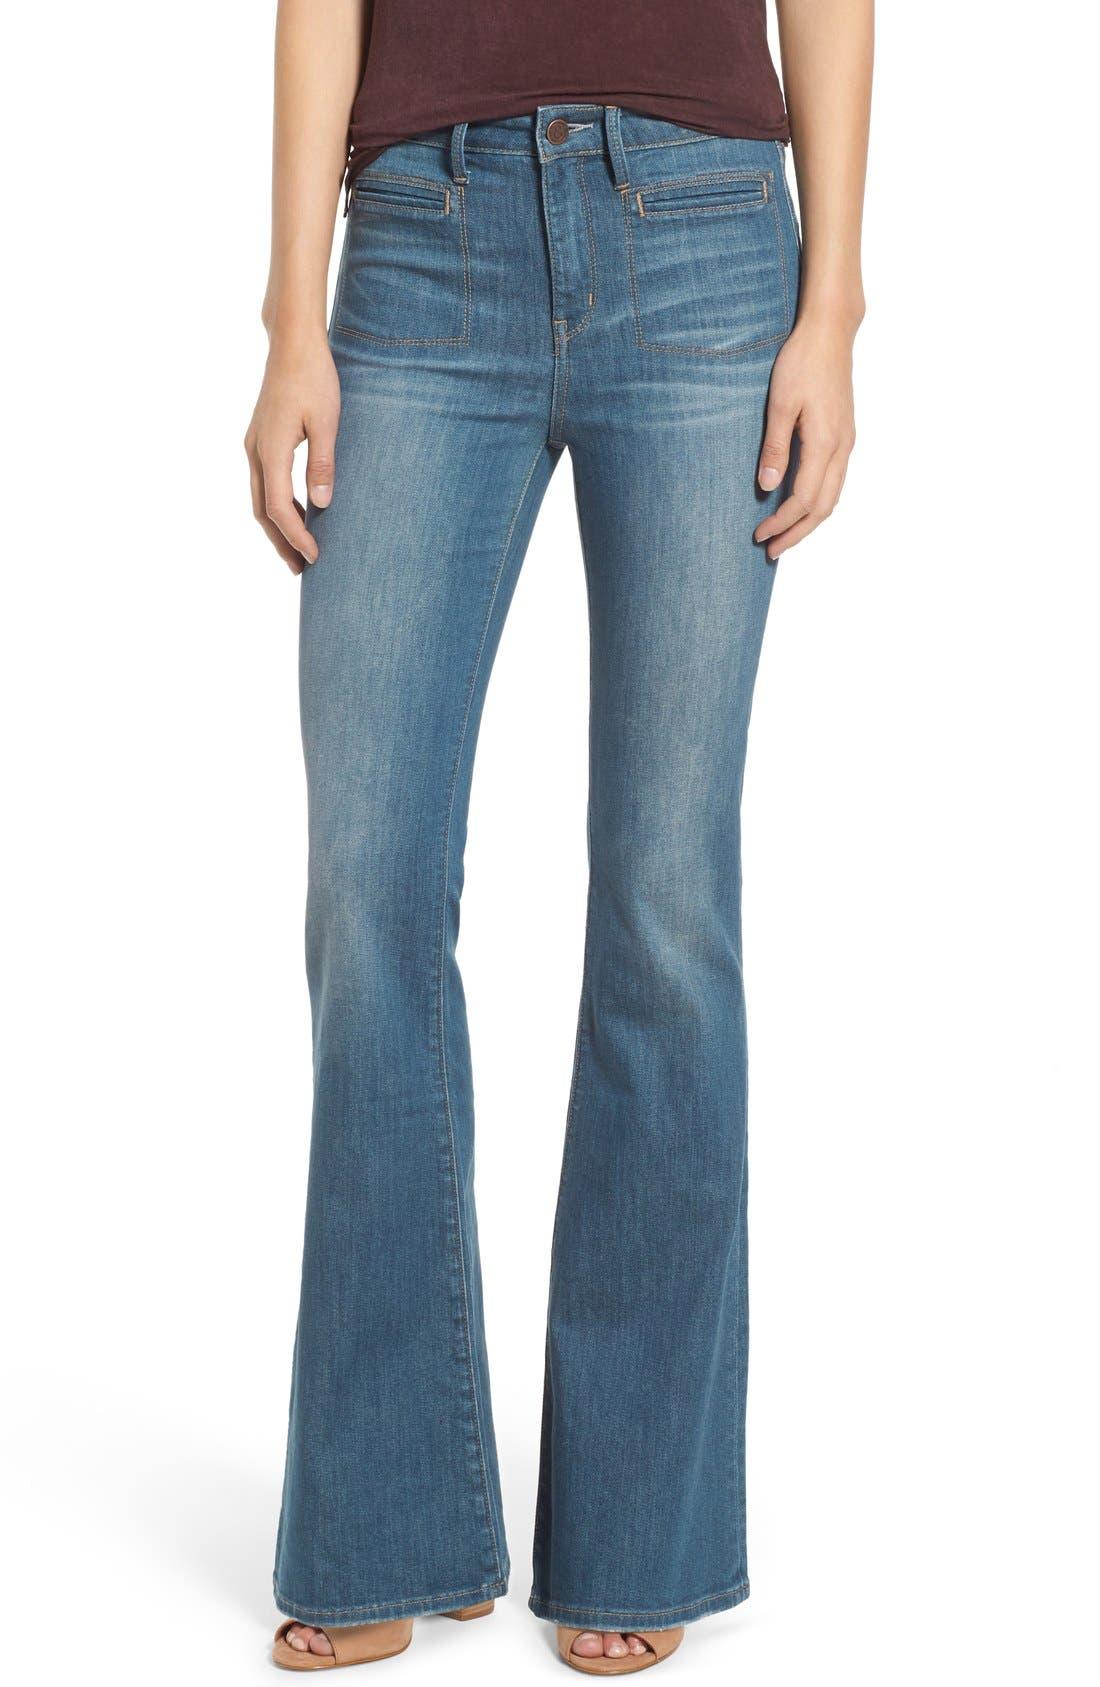 Treasure&Bond High Rise Skinny Flare Jeans,                         Main,                         color, 400